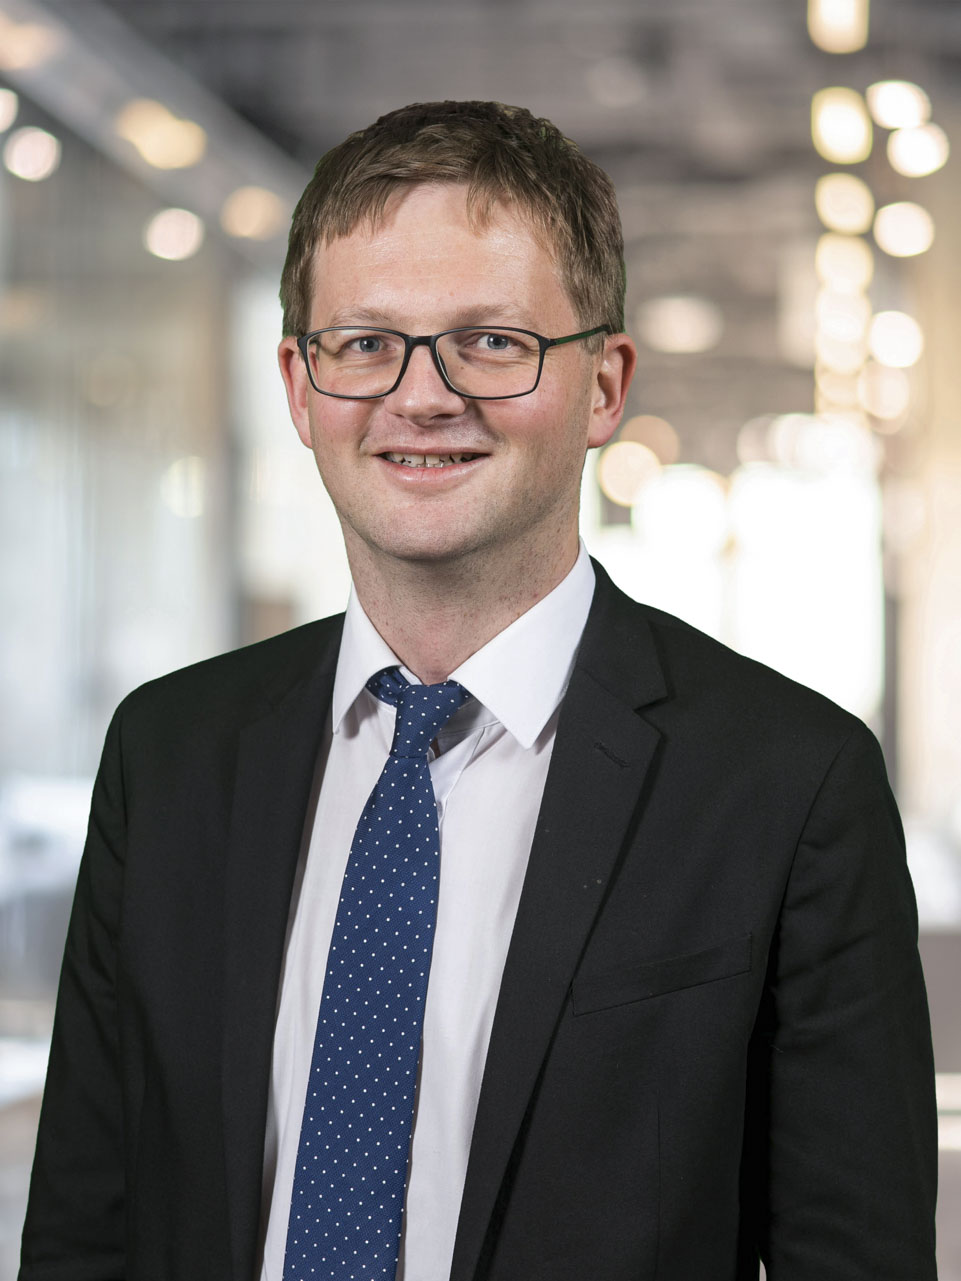 Salzburger Notariatskammer: MMag. Dr. Stefan Webhofer